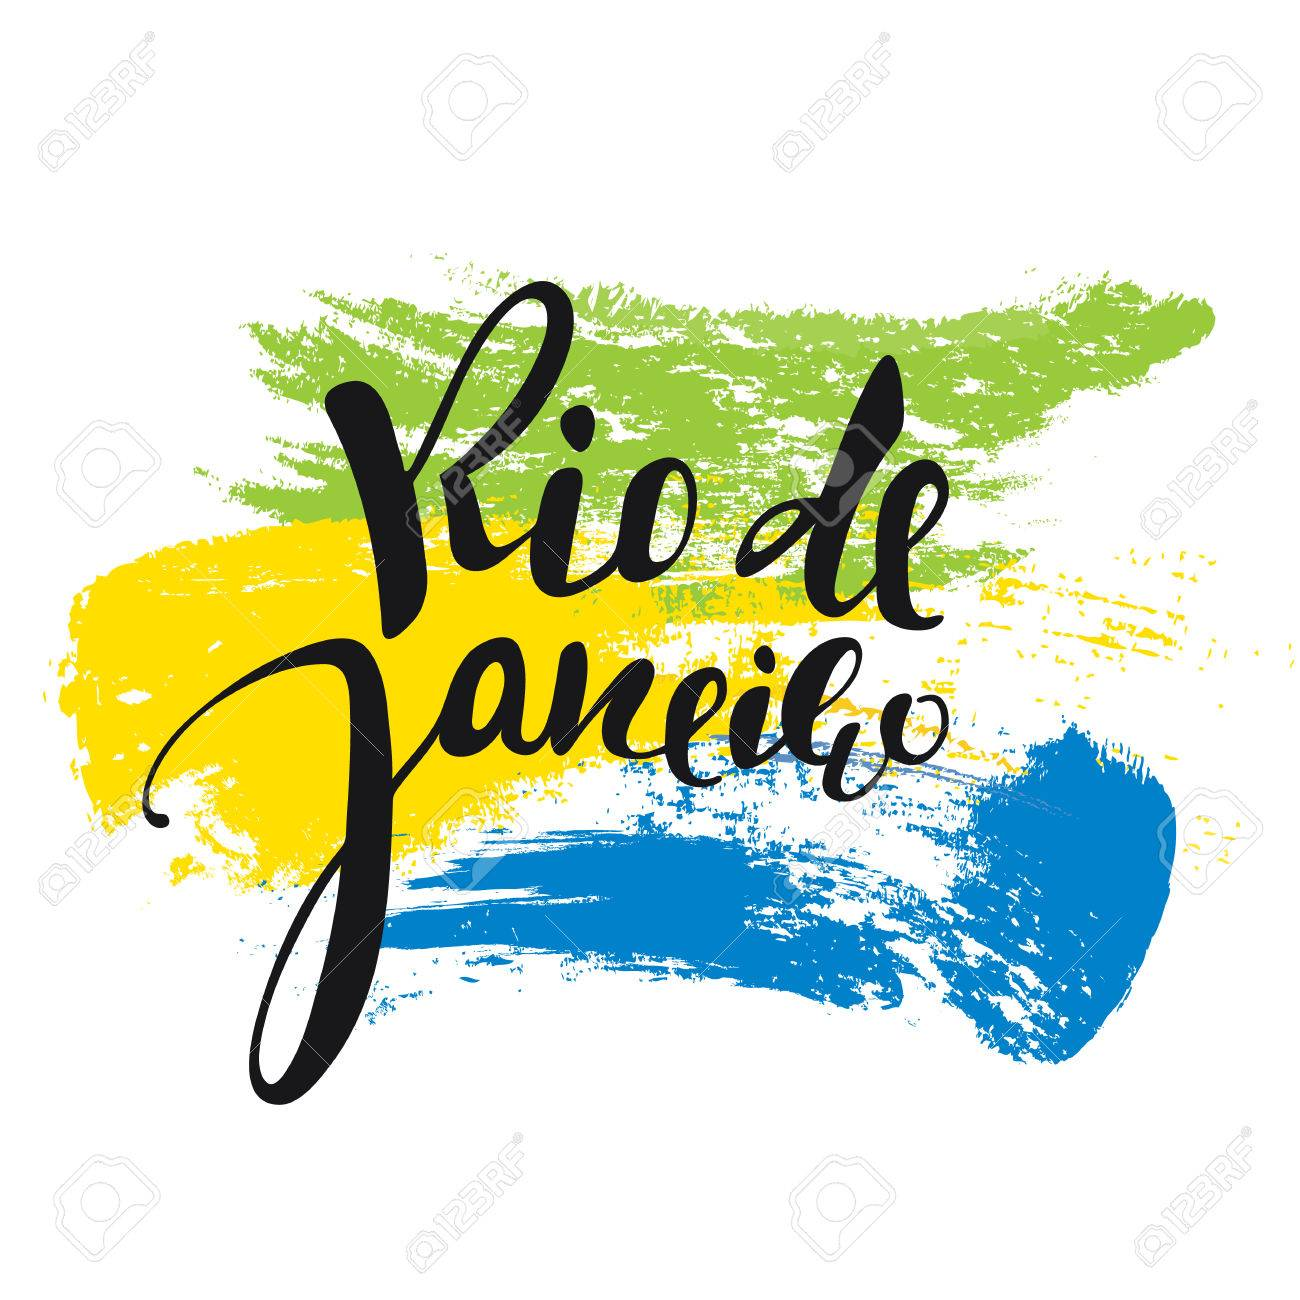 Rio de Janeiro inscription, background colors of the Brazilian...